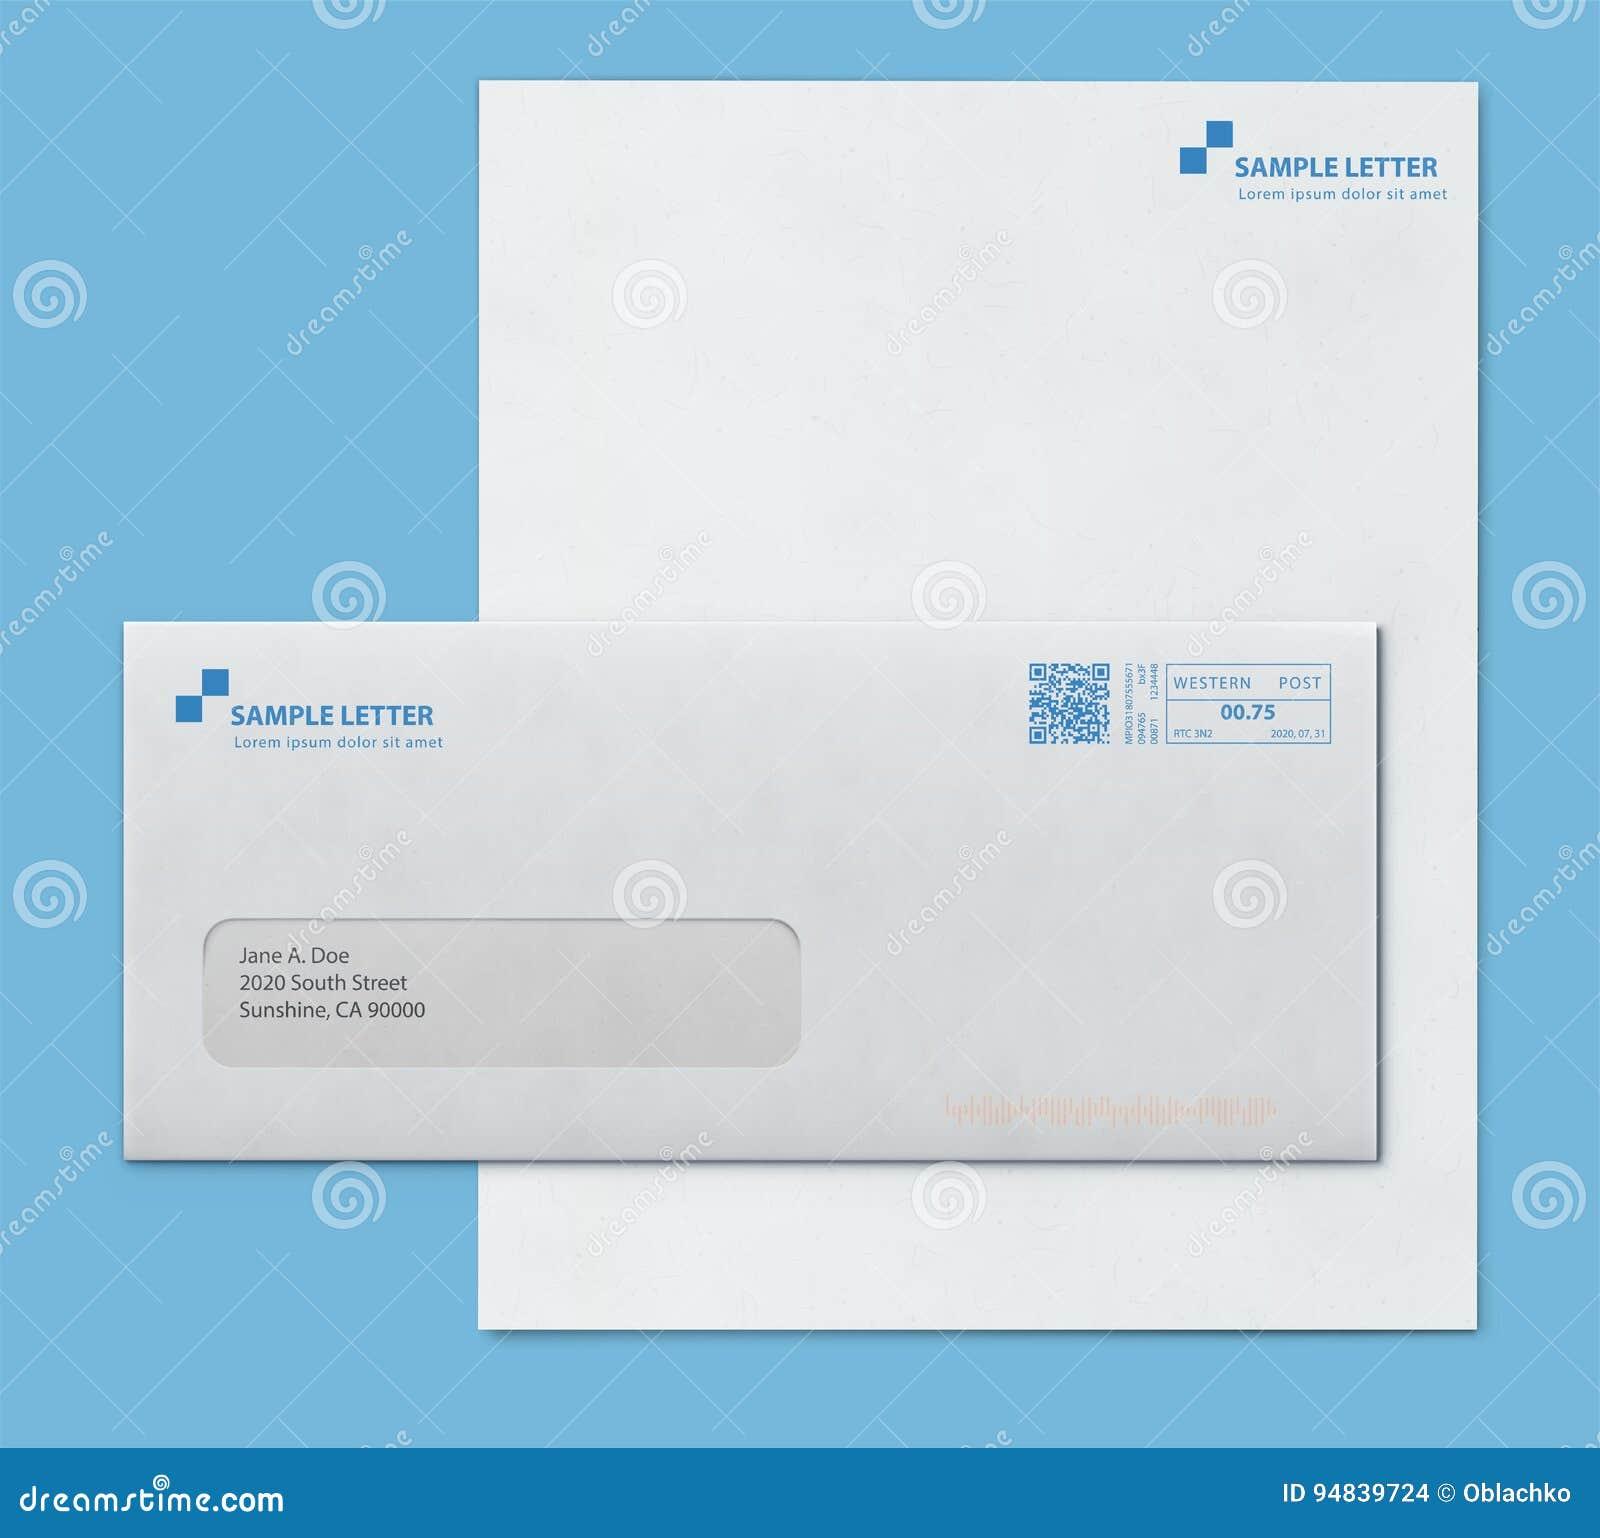 Mockup post envelope and letter paper template stock vector download comp spiritdancerdesigns Images